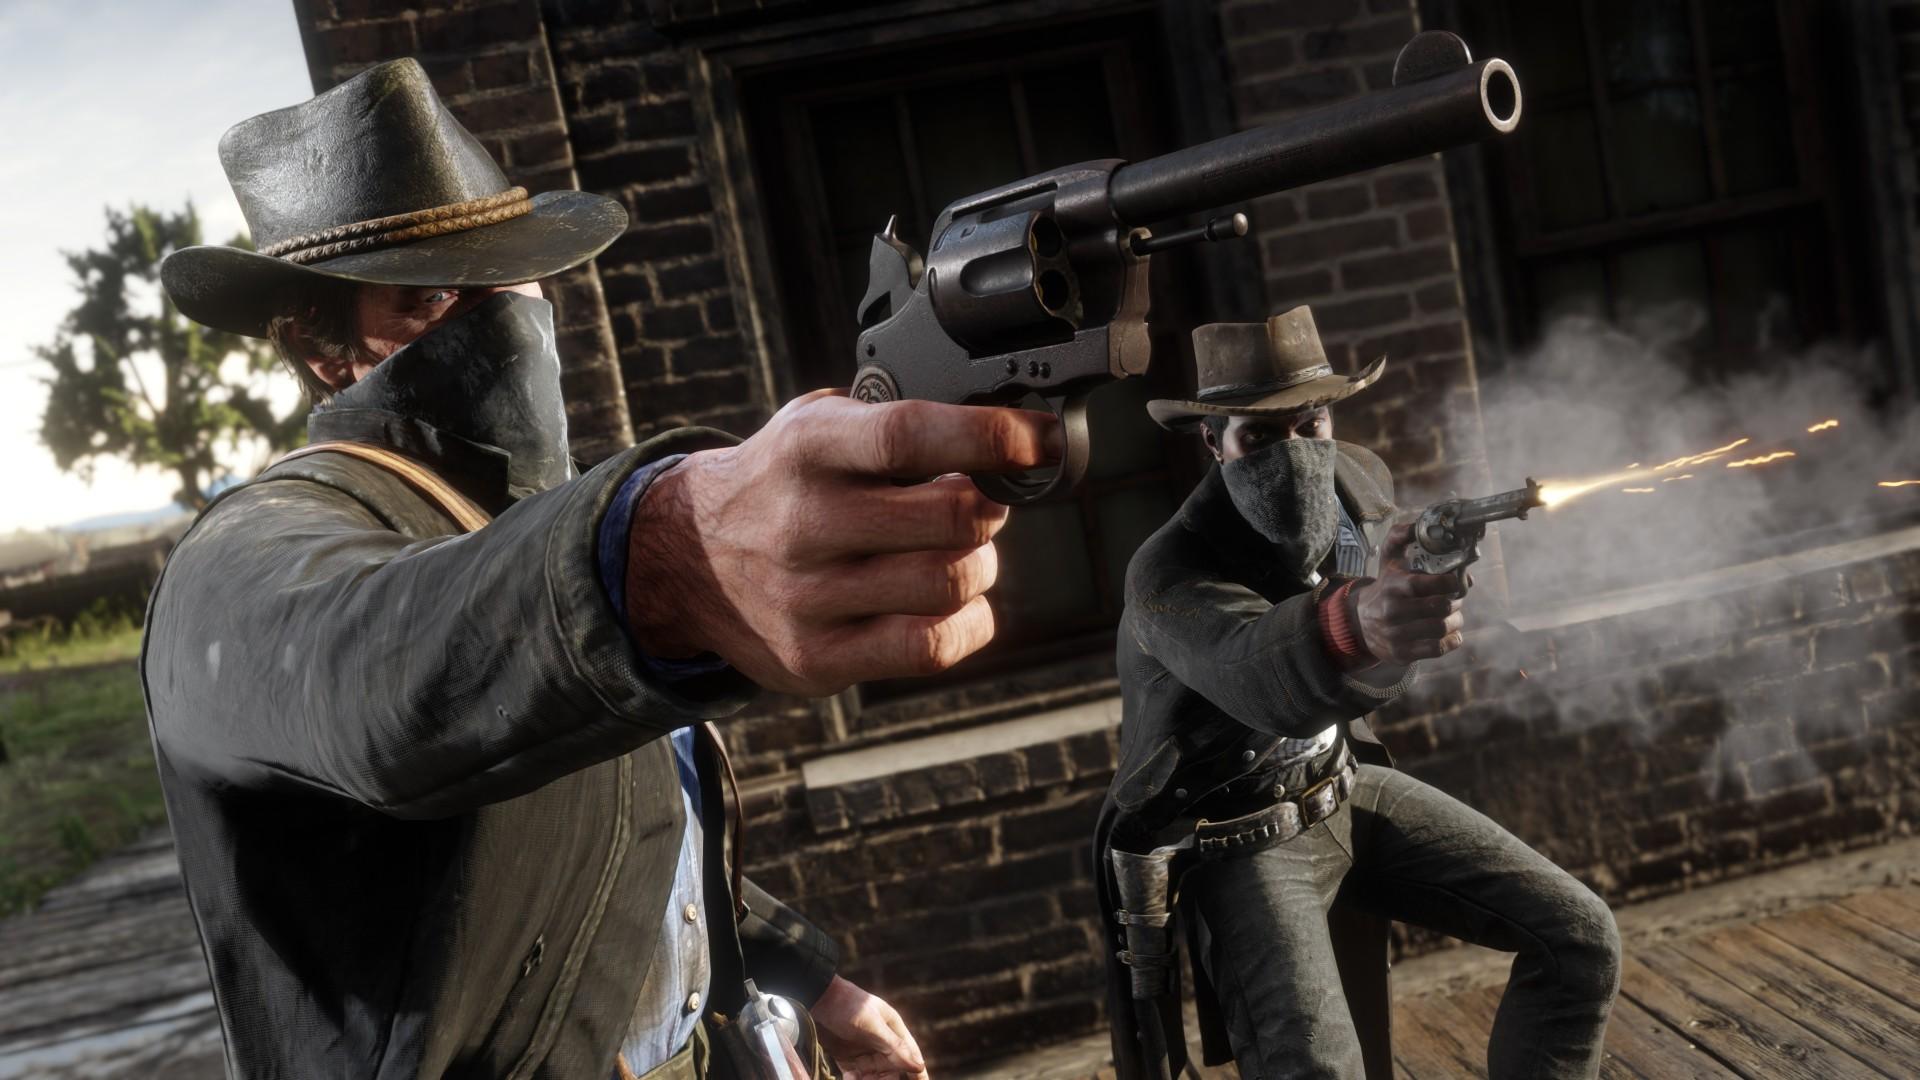 Подробное сравнение графики Red Dead Redemption 2 на PC, PlayStation 4 и Xbox One